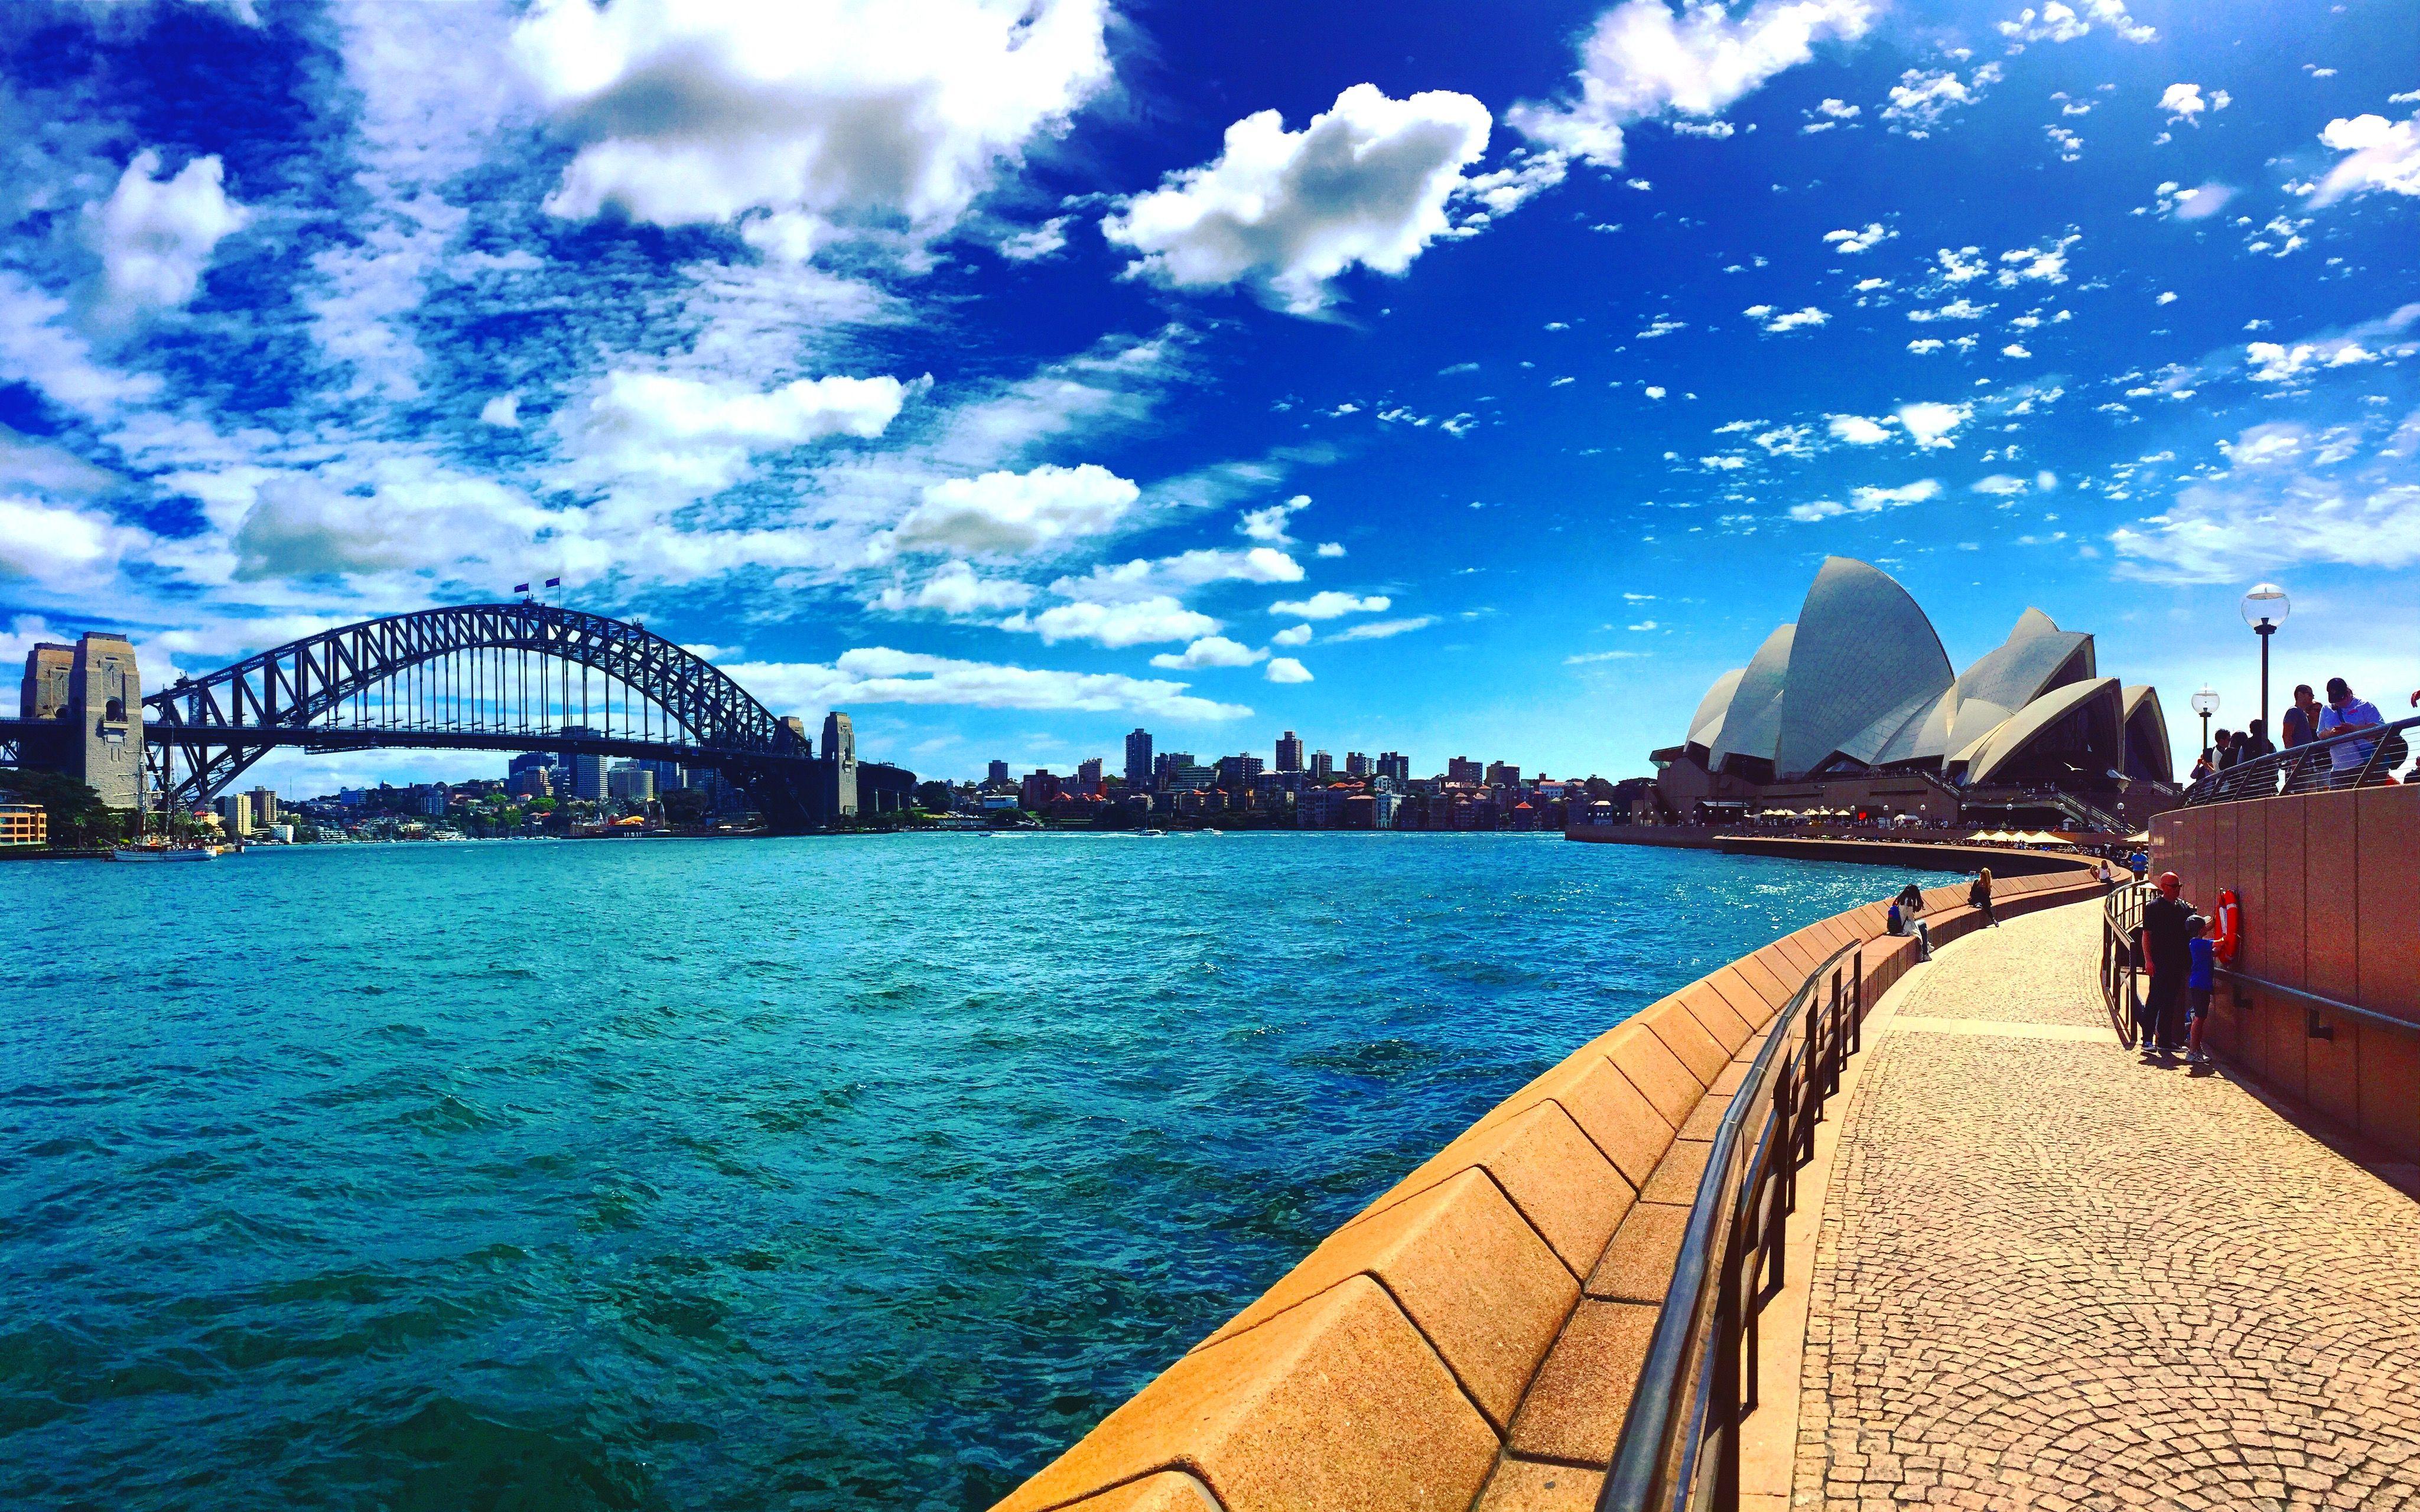 8d5267fe8584d9b03c2ccbc5cd0d0820 - View Sydney Harbour Bridge And Opera House Pictures  PNG